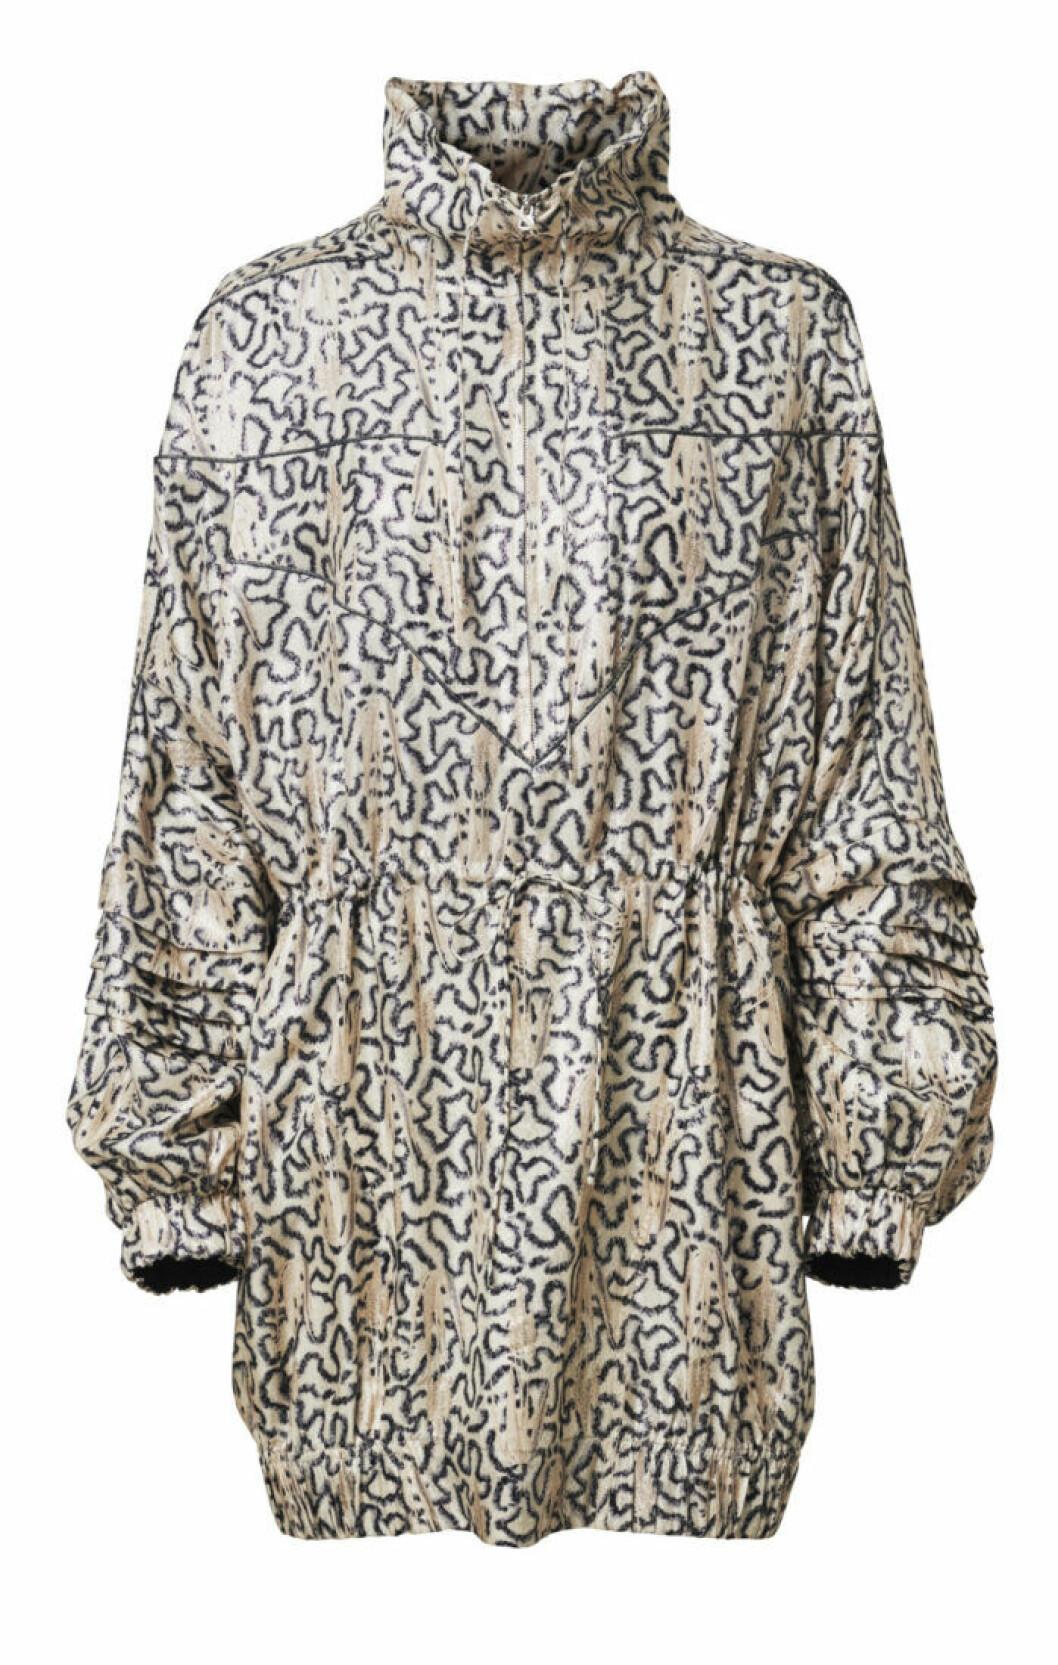 H&M Conscious Exclusive 2019 mönstrad jacka med hög krage